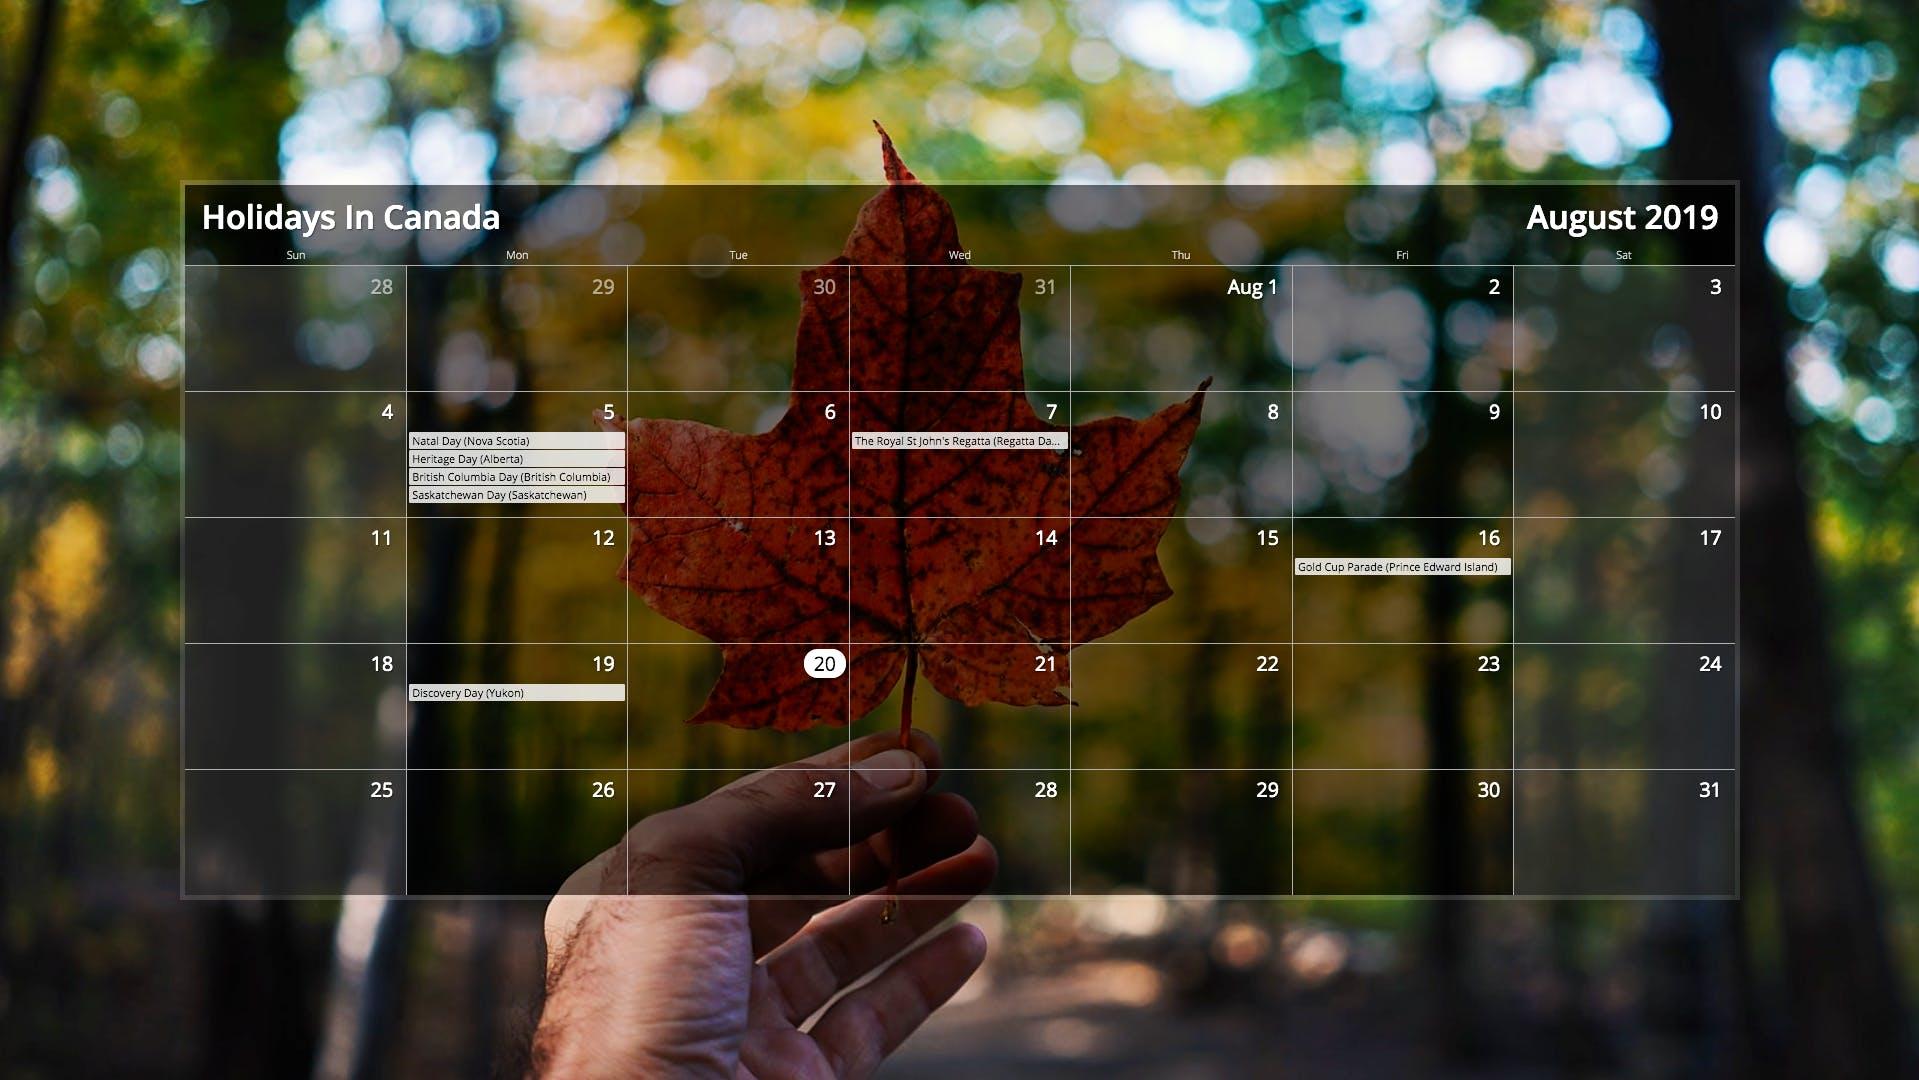 Calendar for Digital Signage image carousel